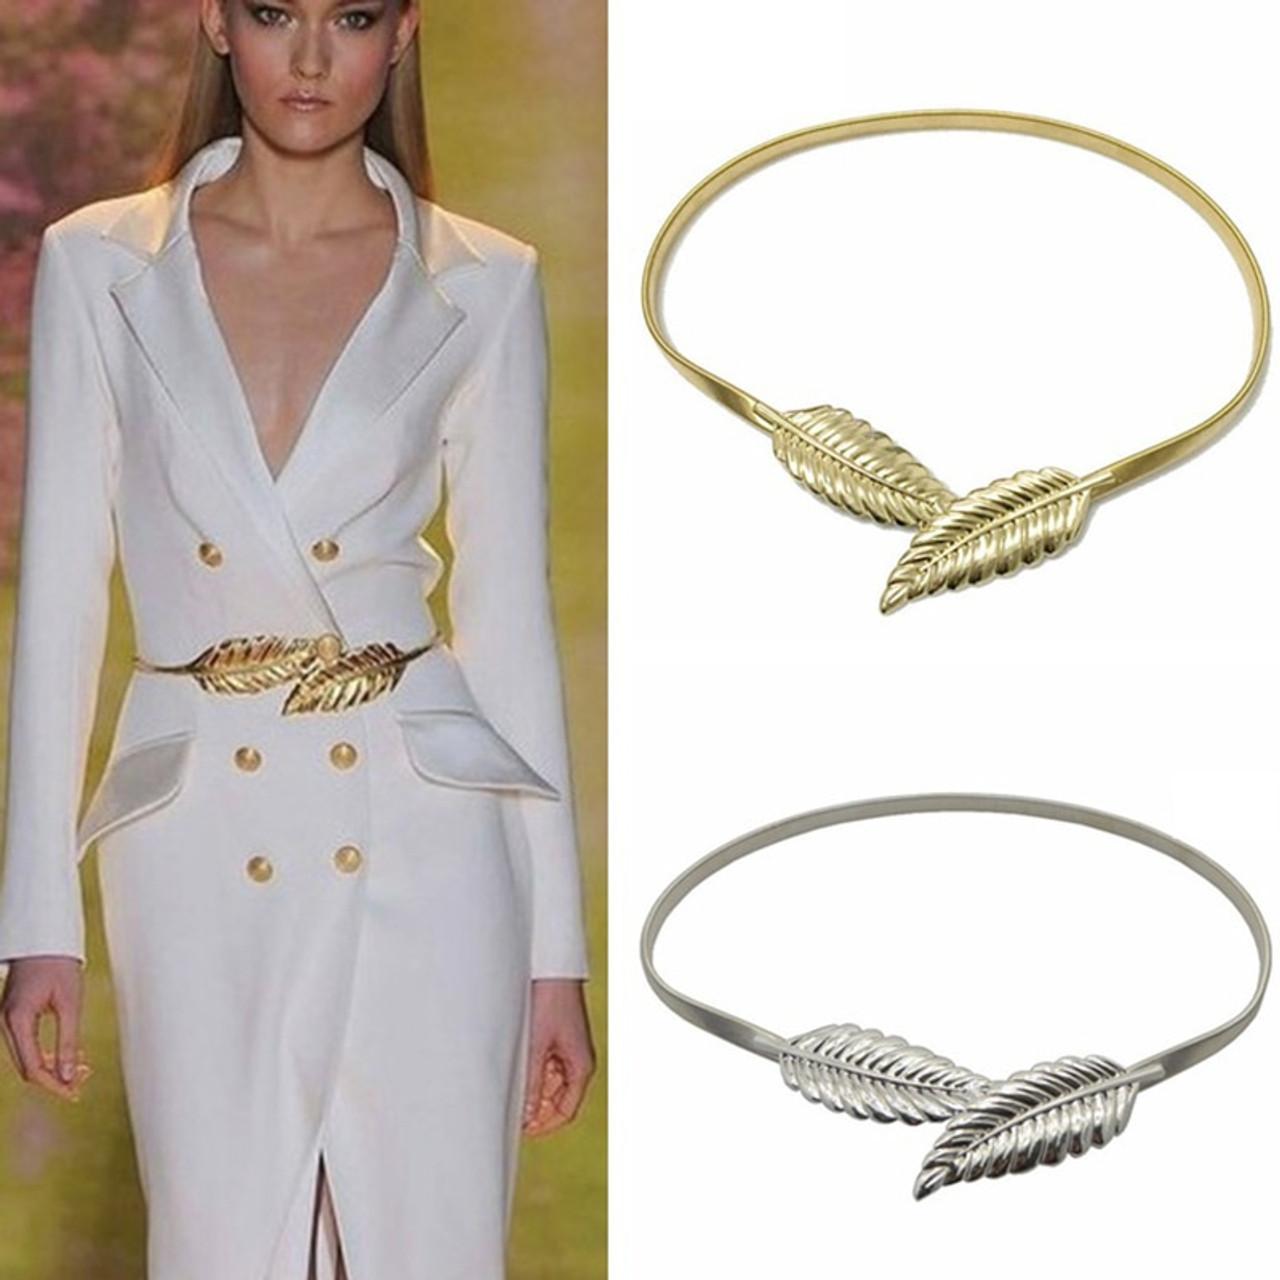 a48fe3345 Clothing, Shoes & Jewelry Girls Beautiful Women Belt Silver LEAF Elastic  Metal Stretch High Waist Dress ...